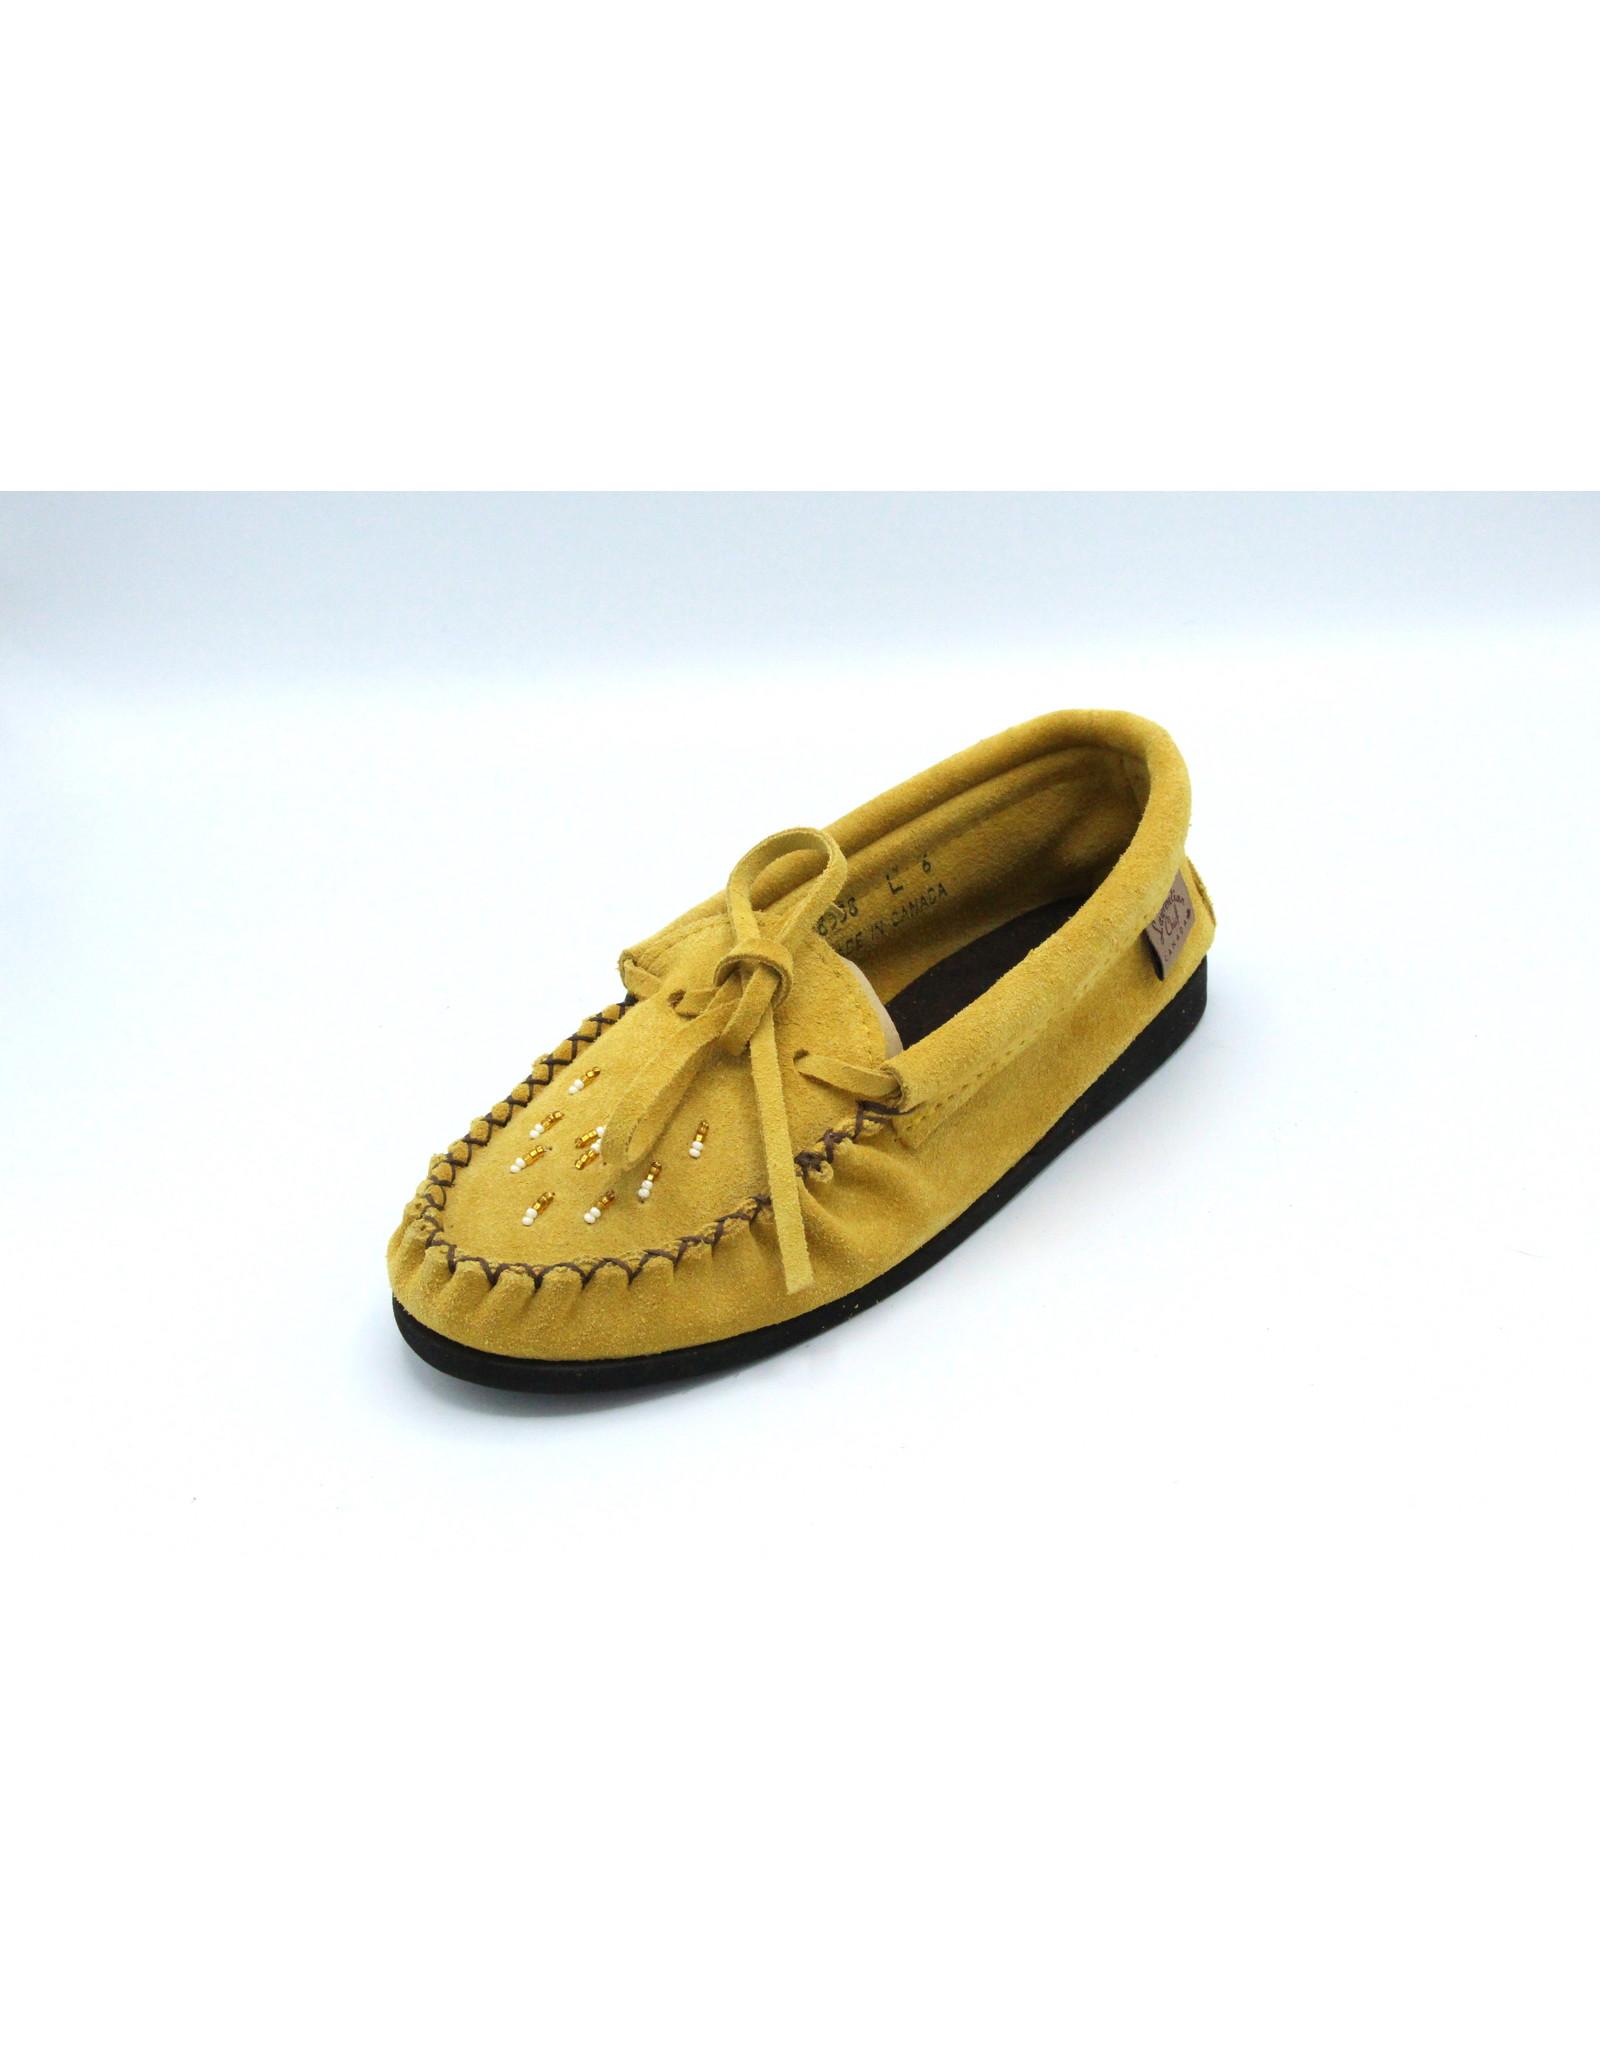 Indian Tan Moccasin - 8538L